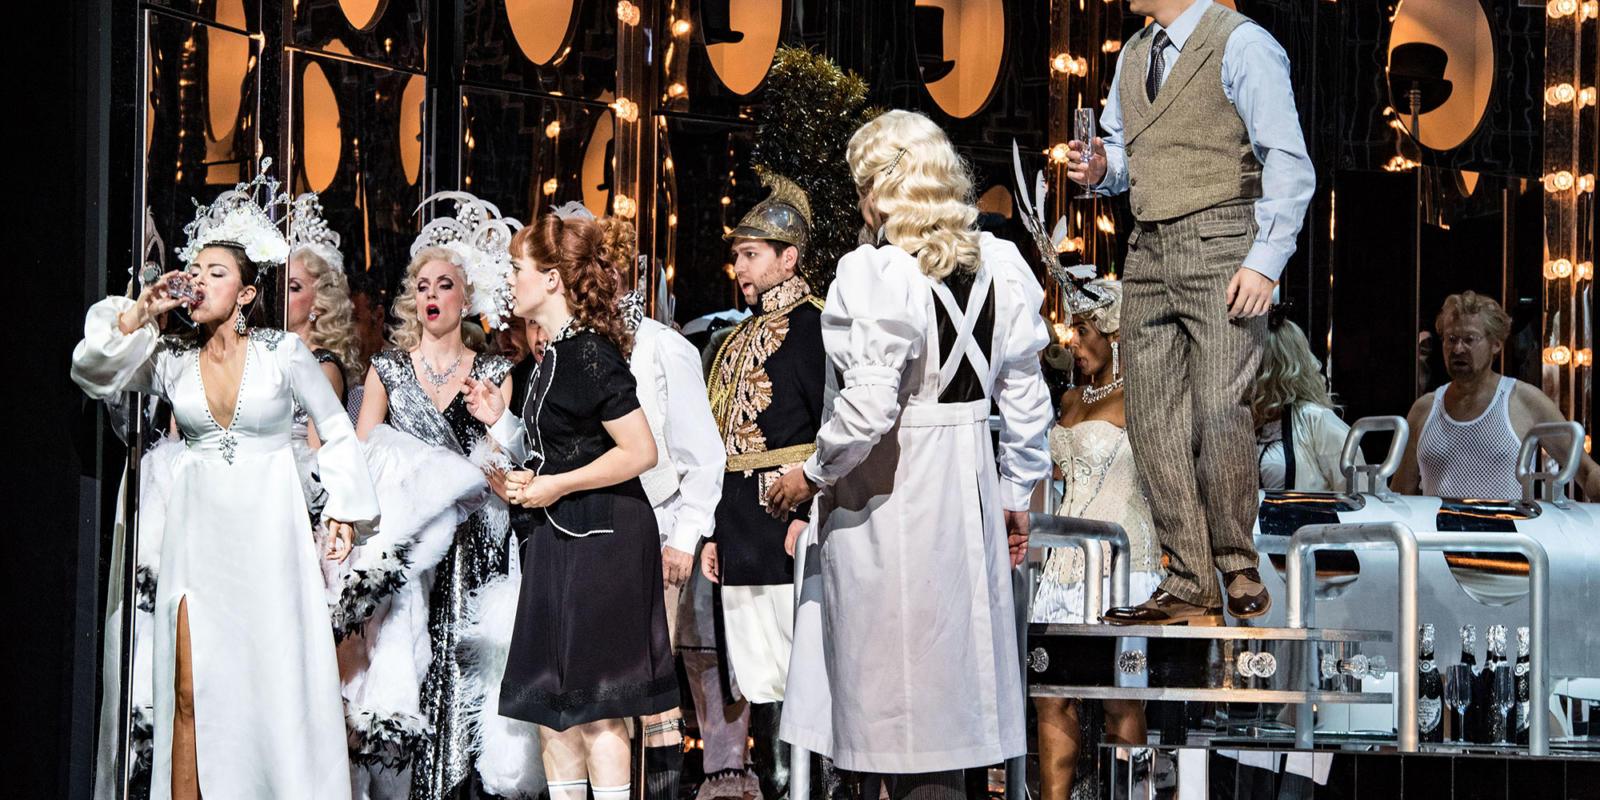 La-traviata_Winters-Stanek-Bickel-Murphy-Valuzhyn-®-Sandra-Then